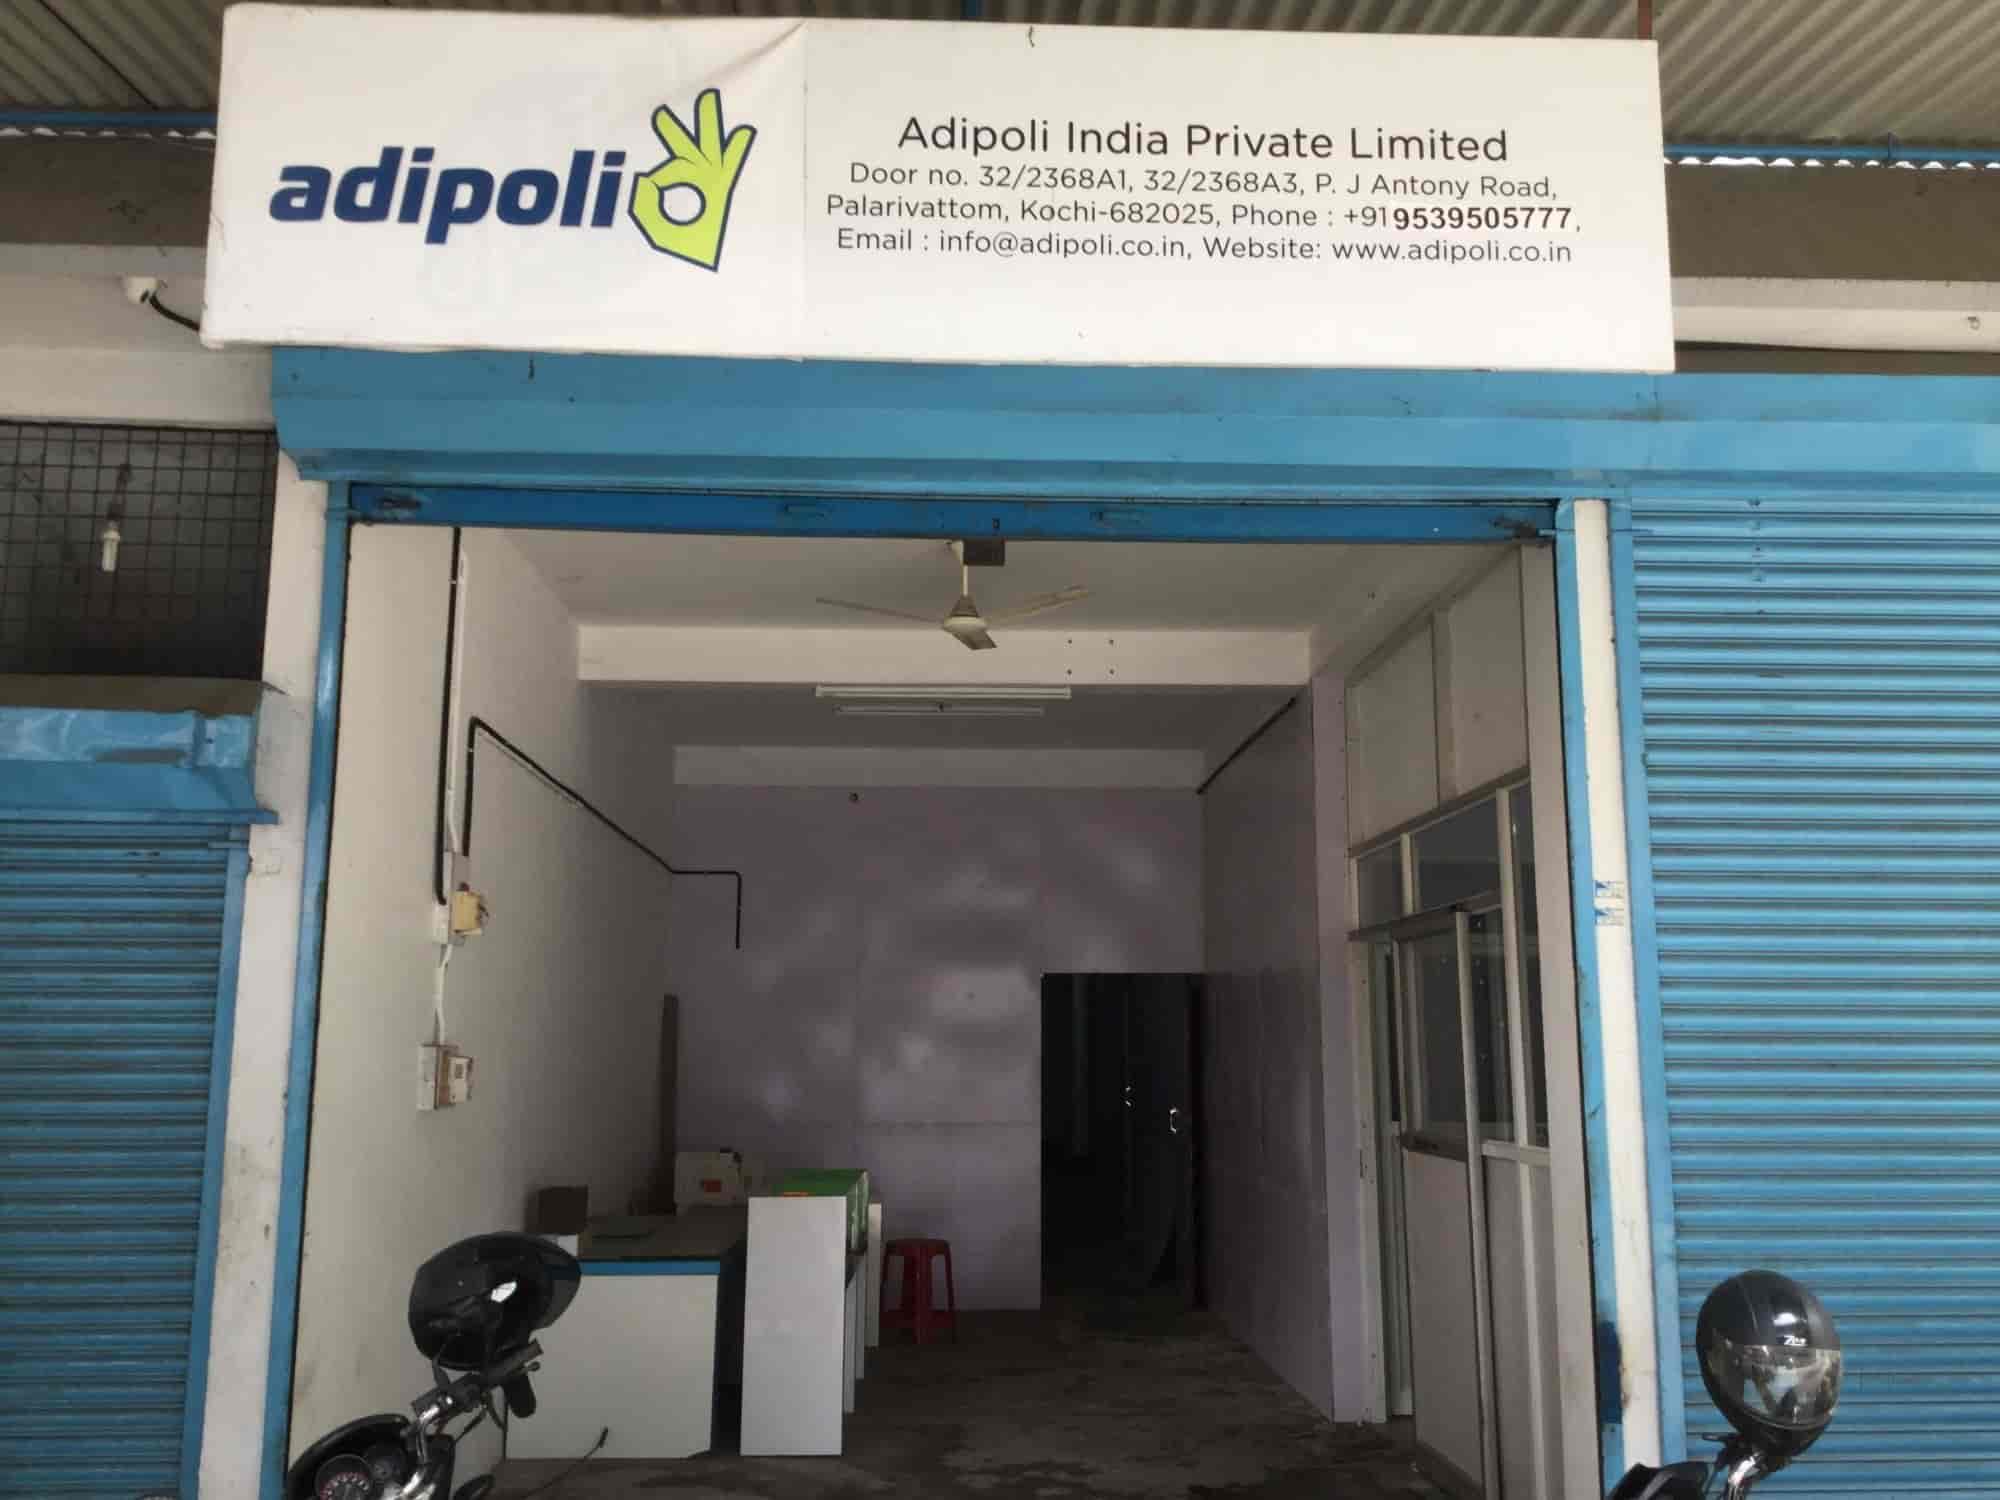 Adipoli India Pvt Ltd, Palarivattom - Online Shopping Websites in